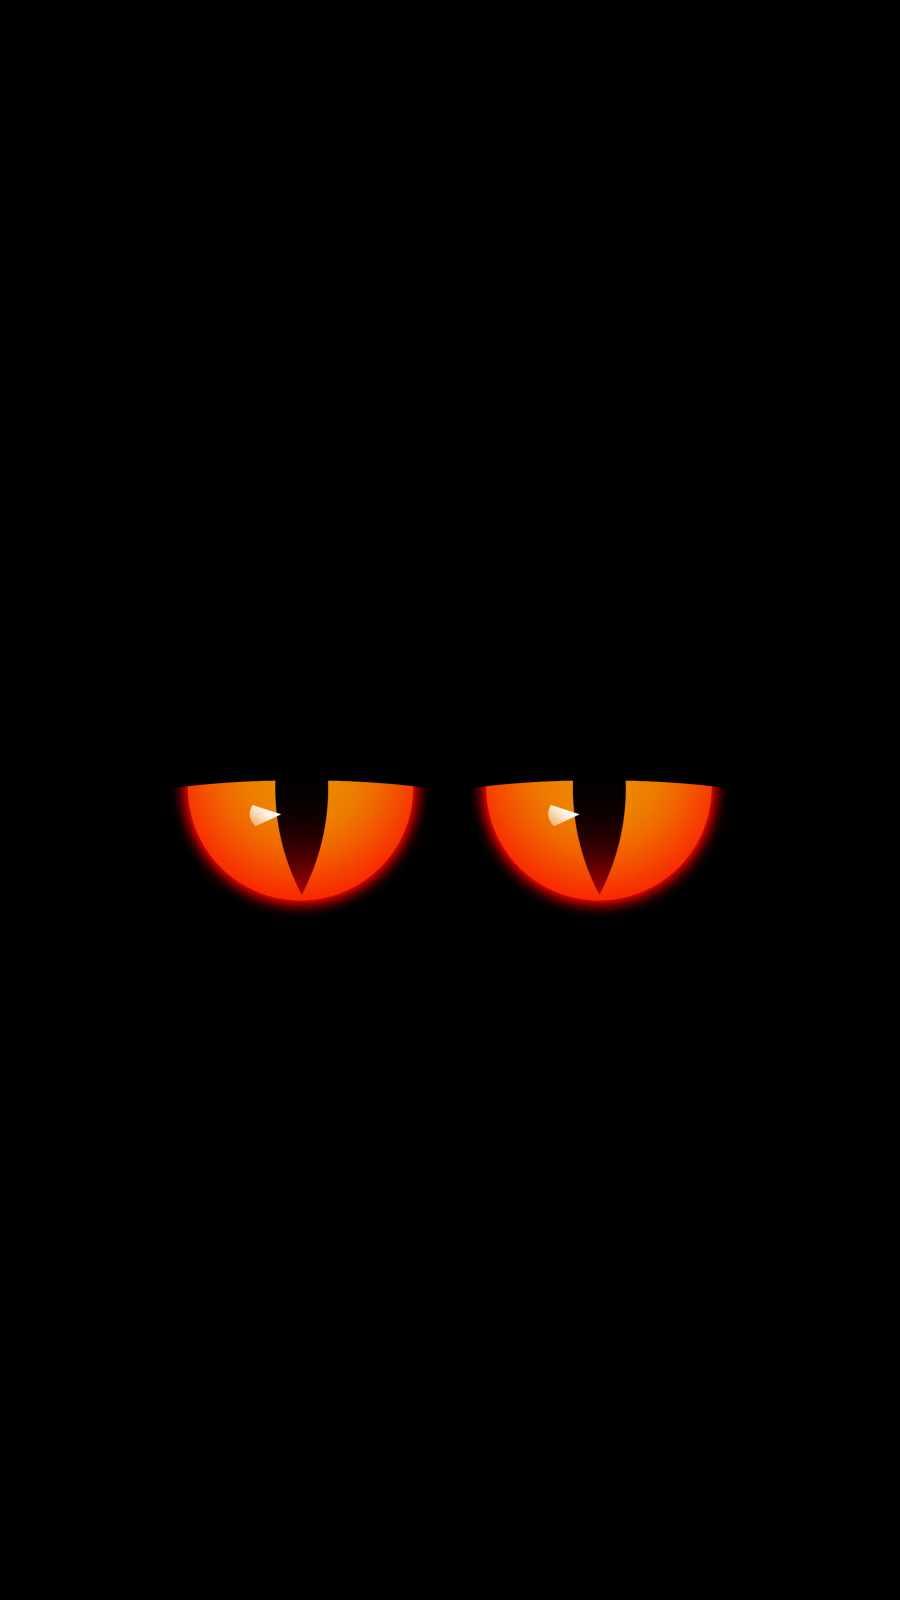 Devil Eyes iPhone Wallpaper